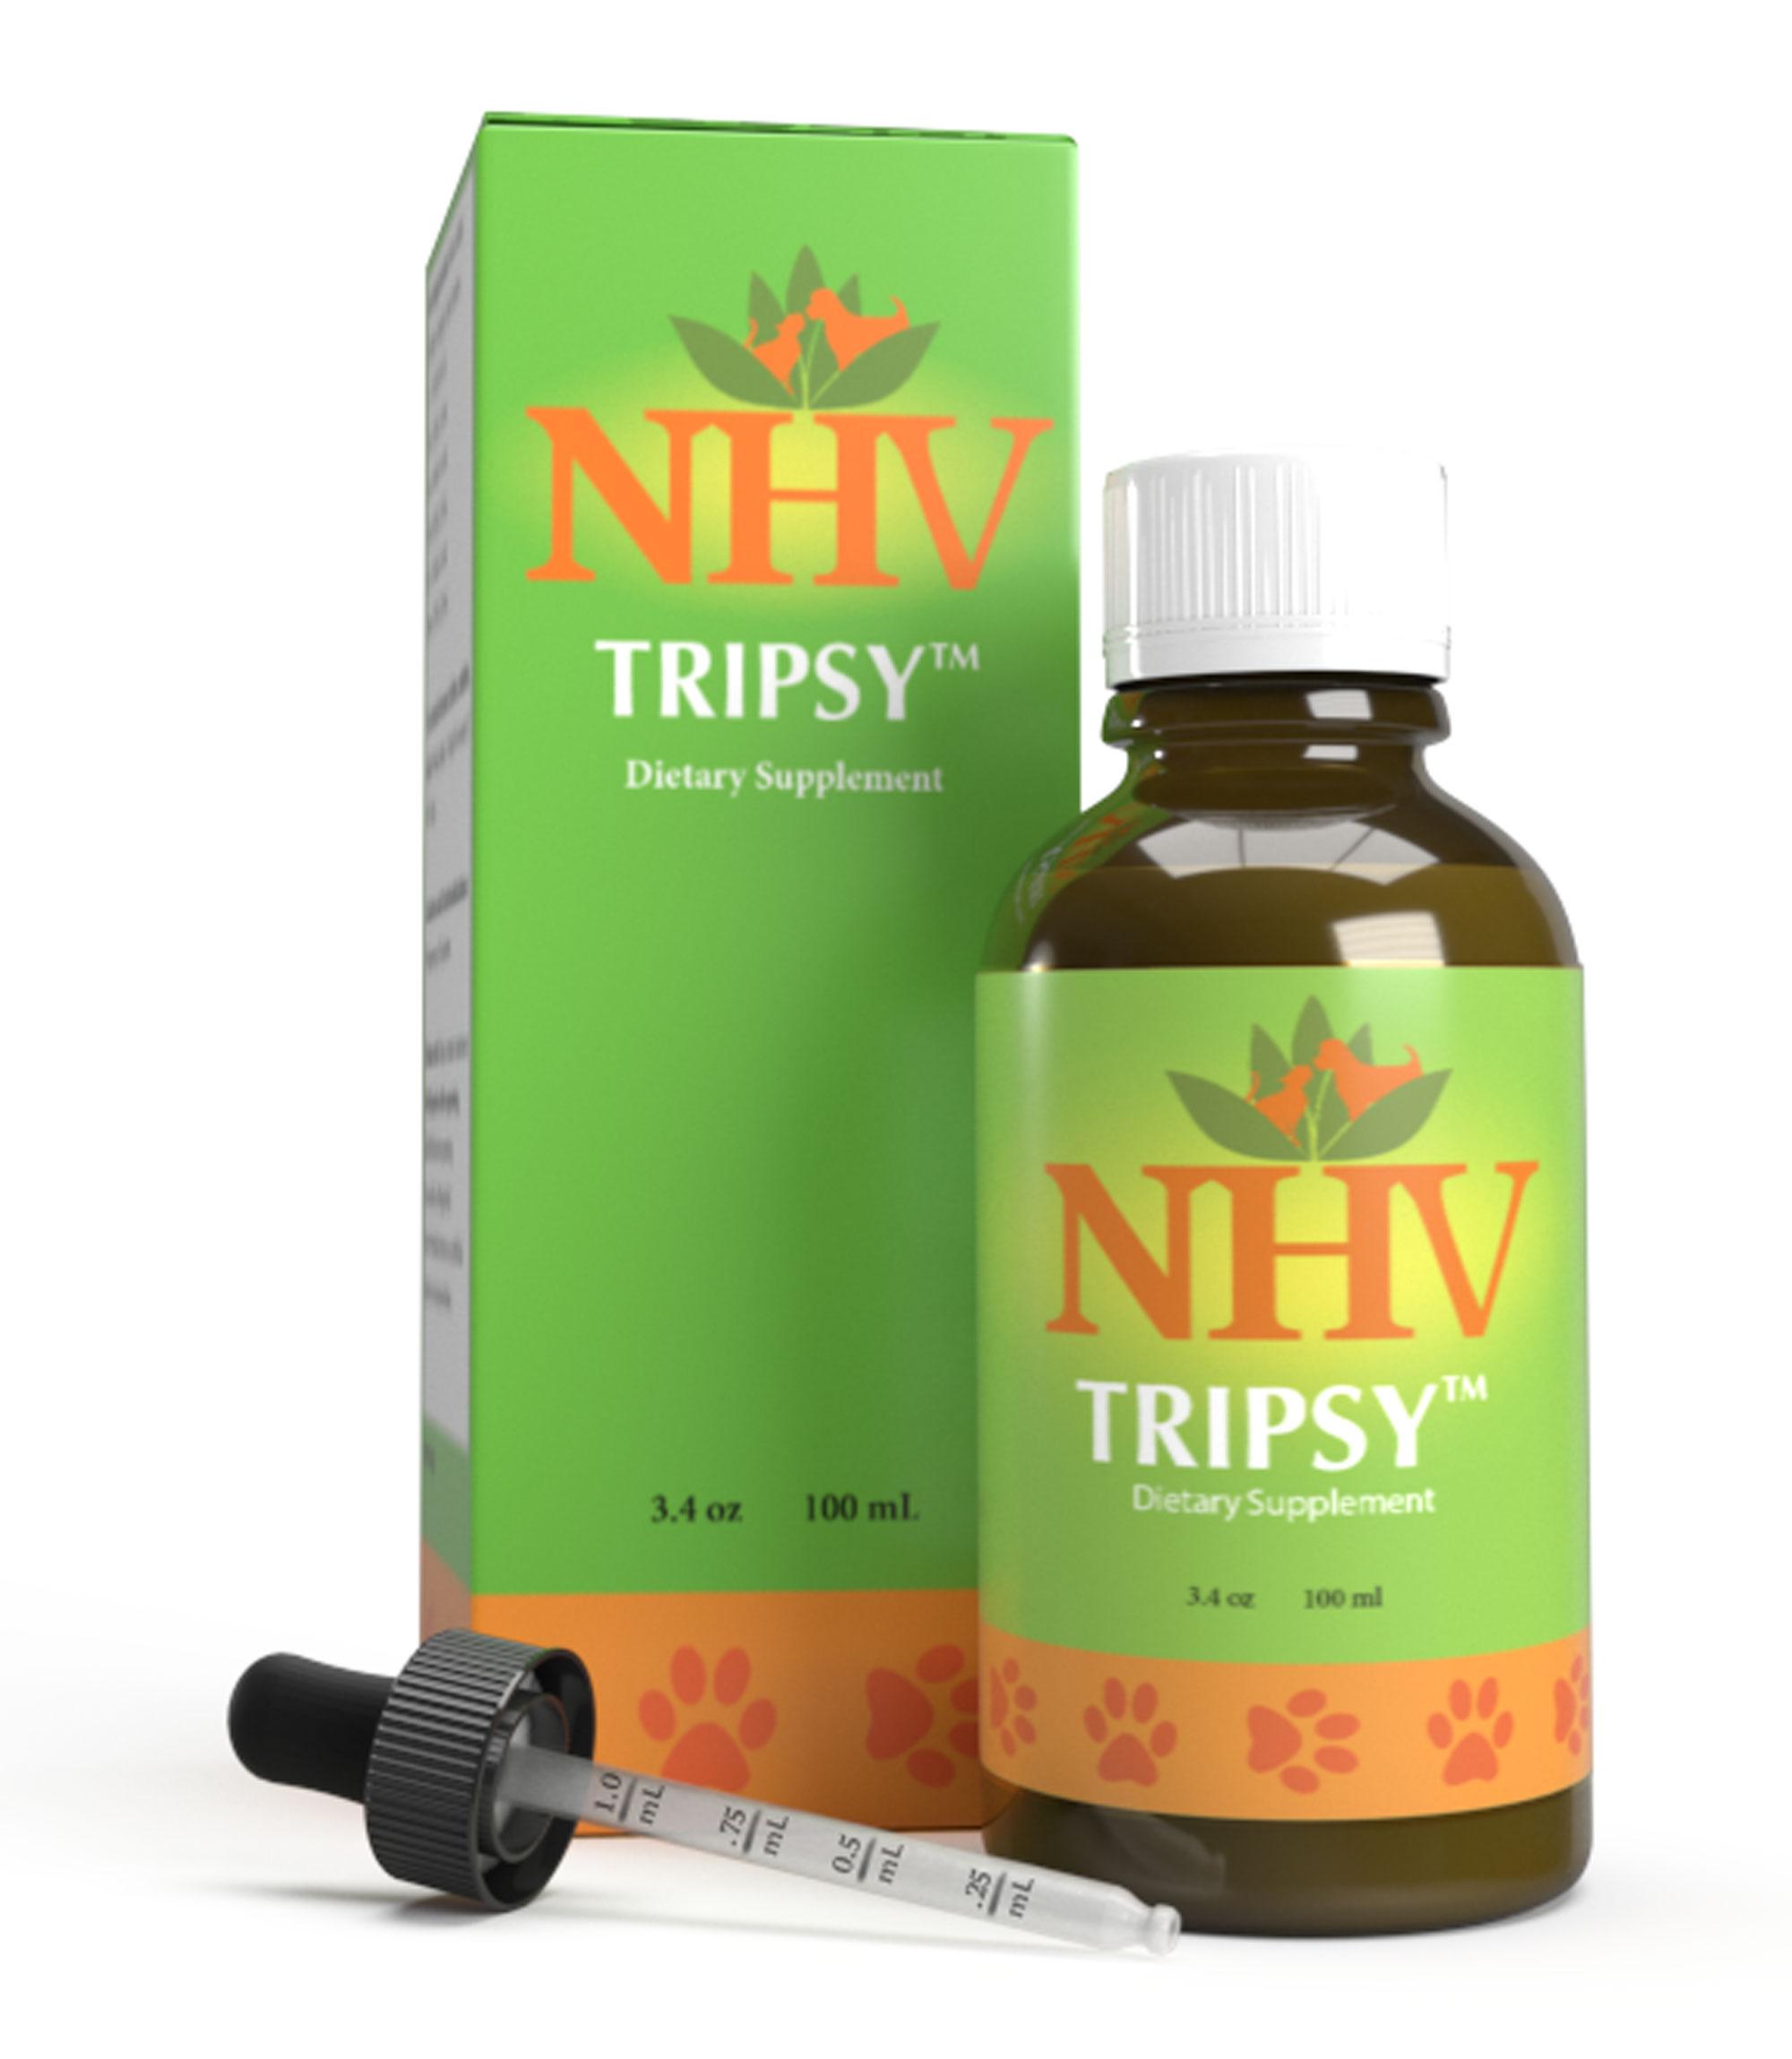 NHV Tripsy